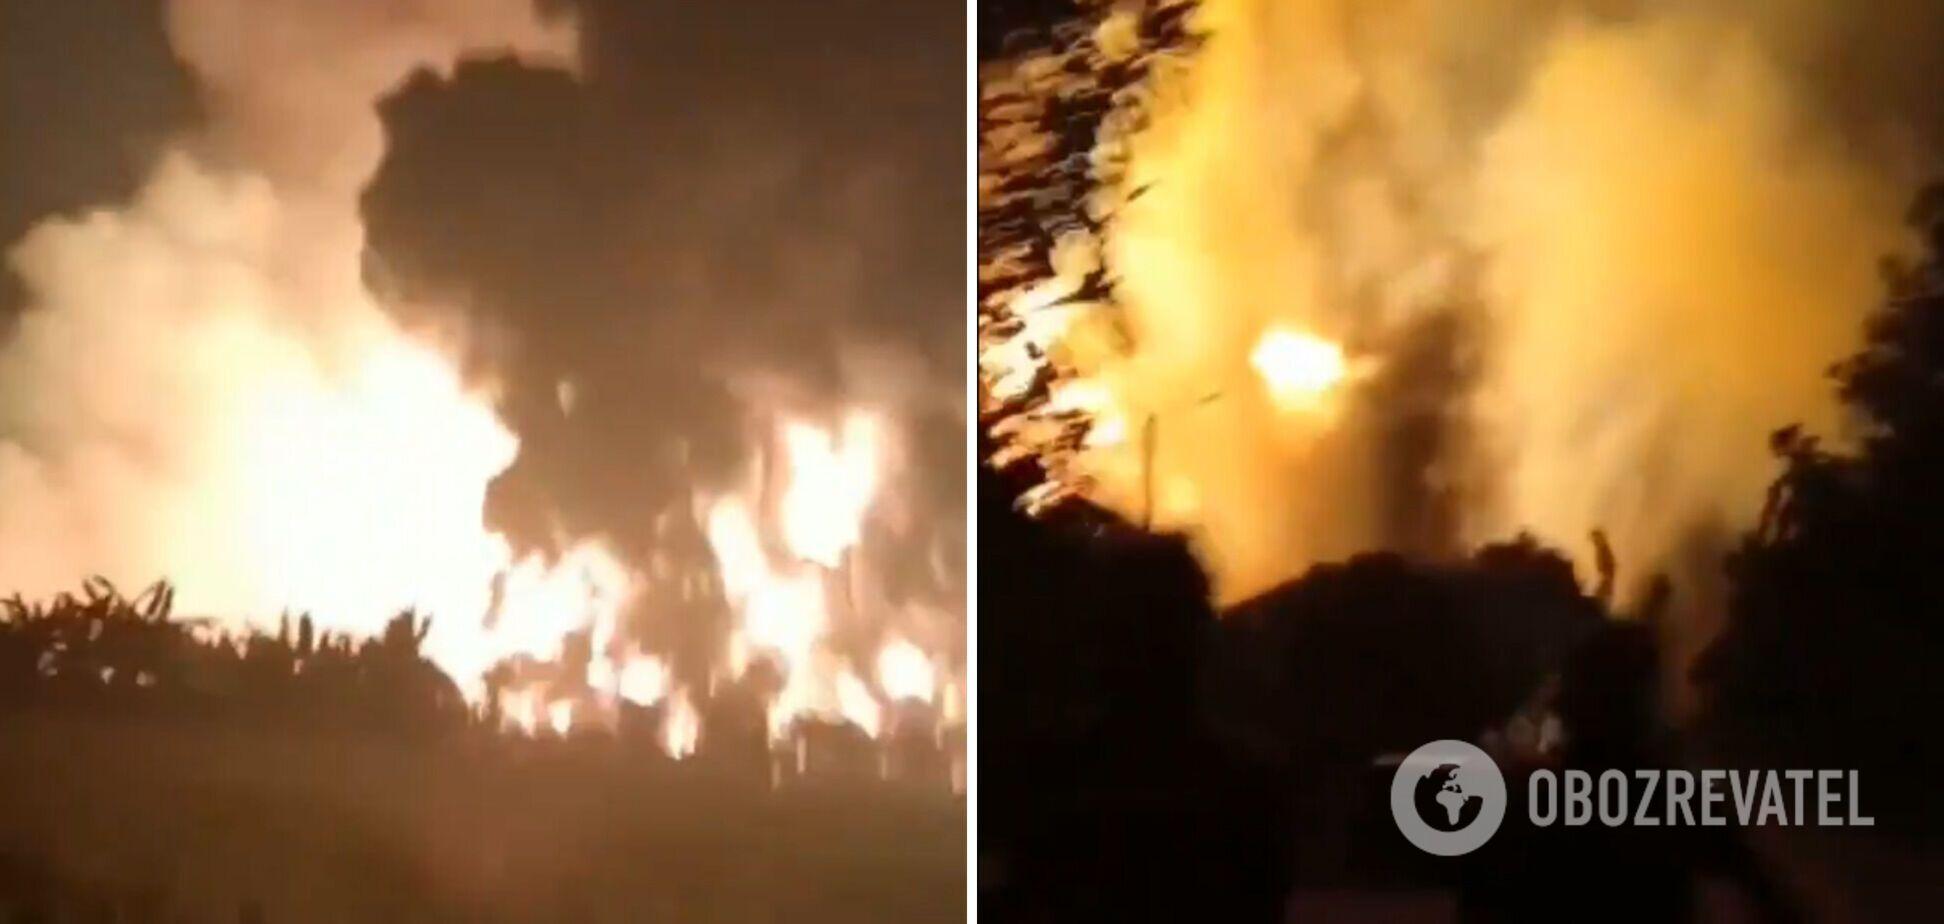 Пожар на заводе в Индонезии